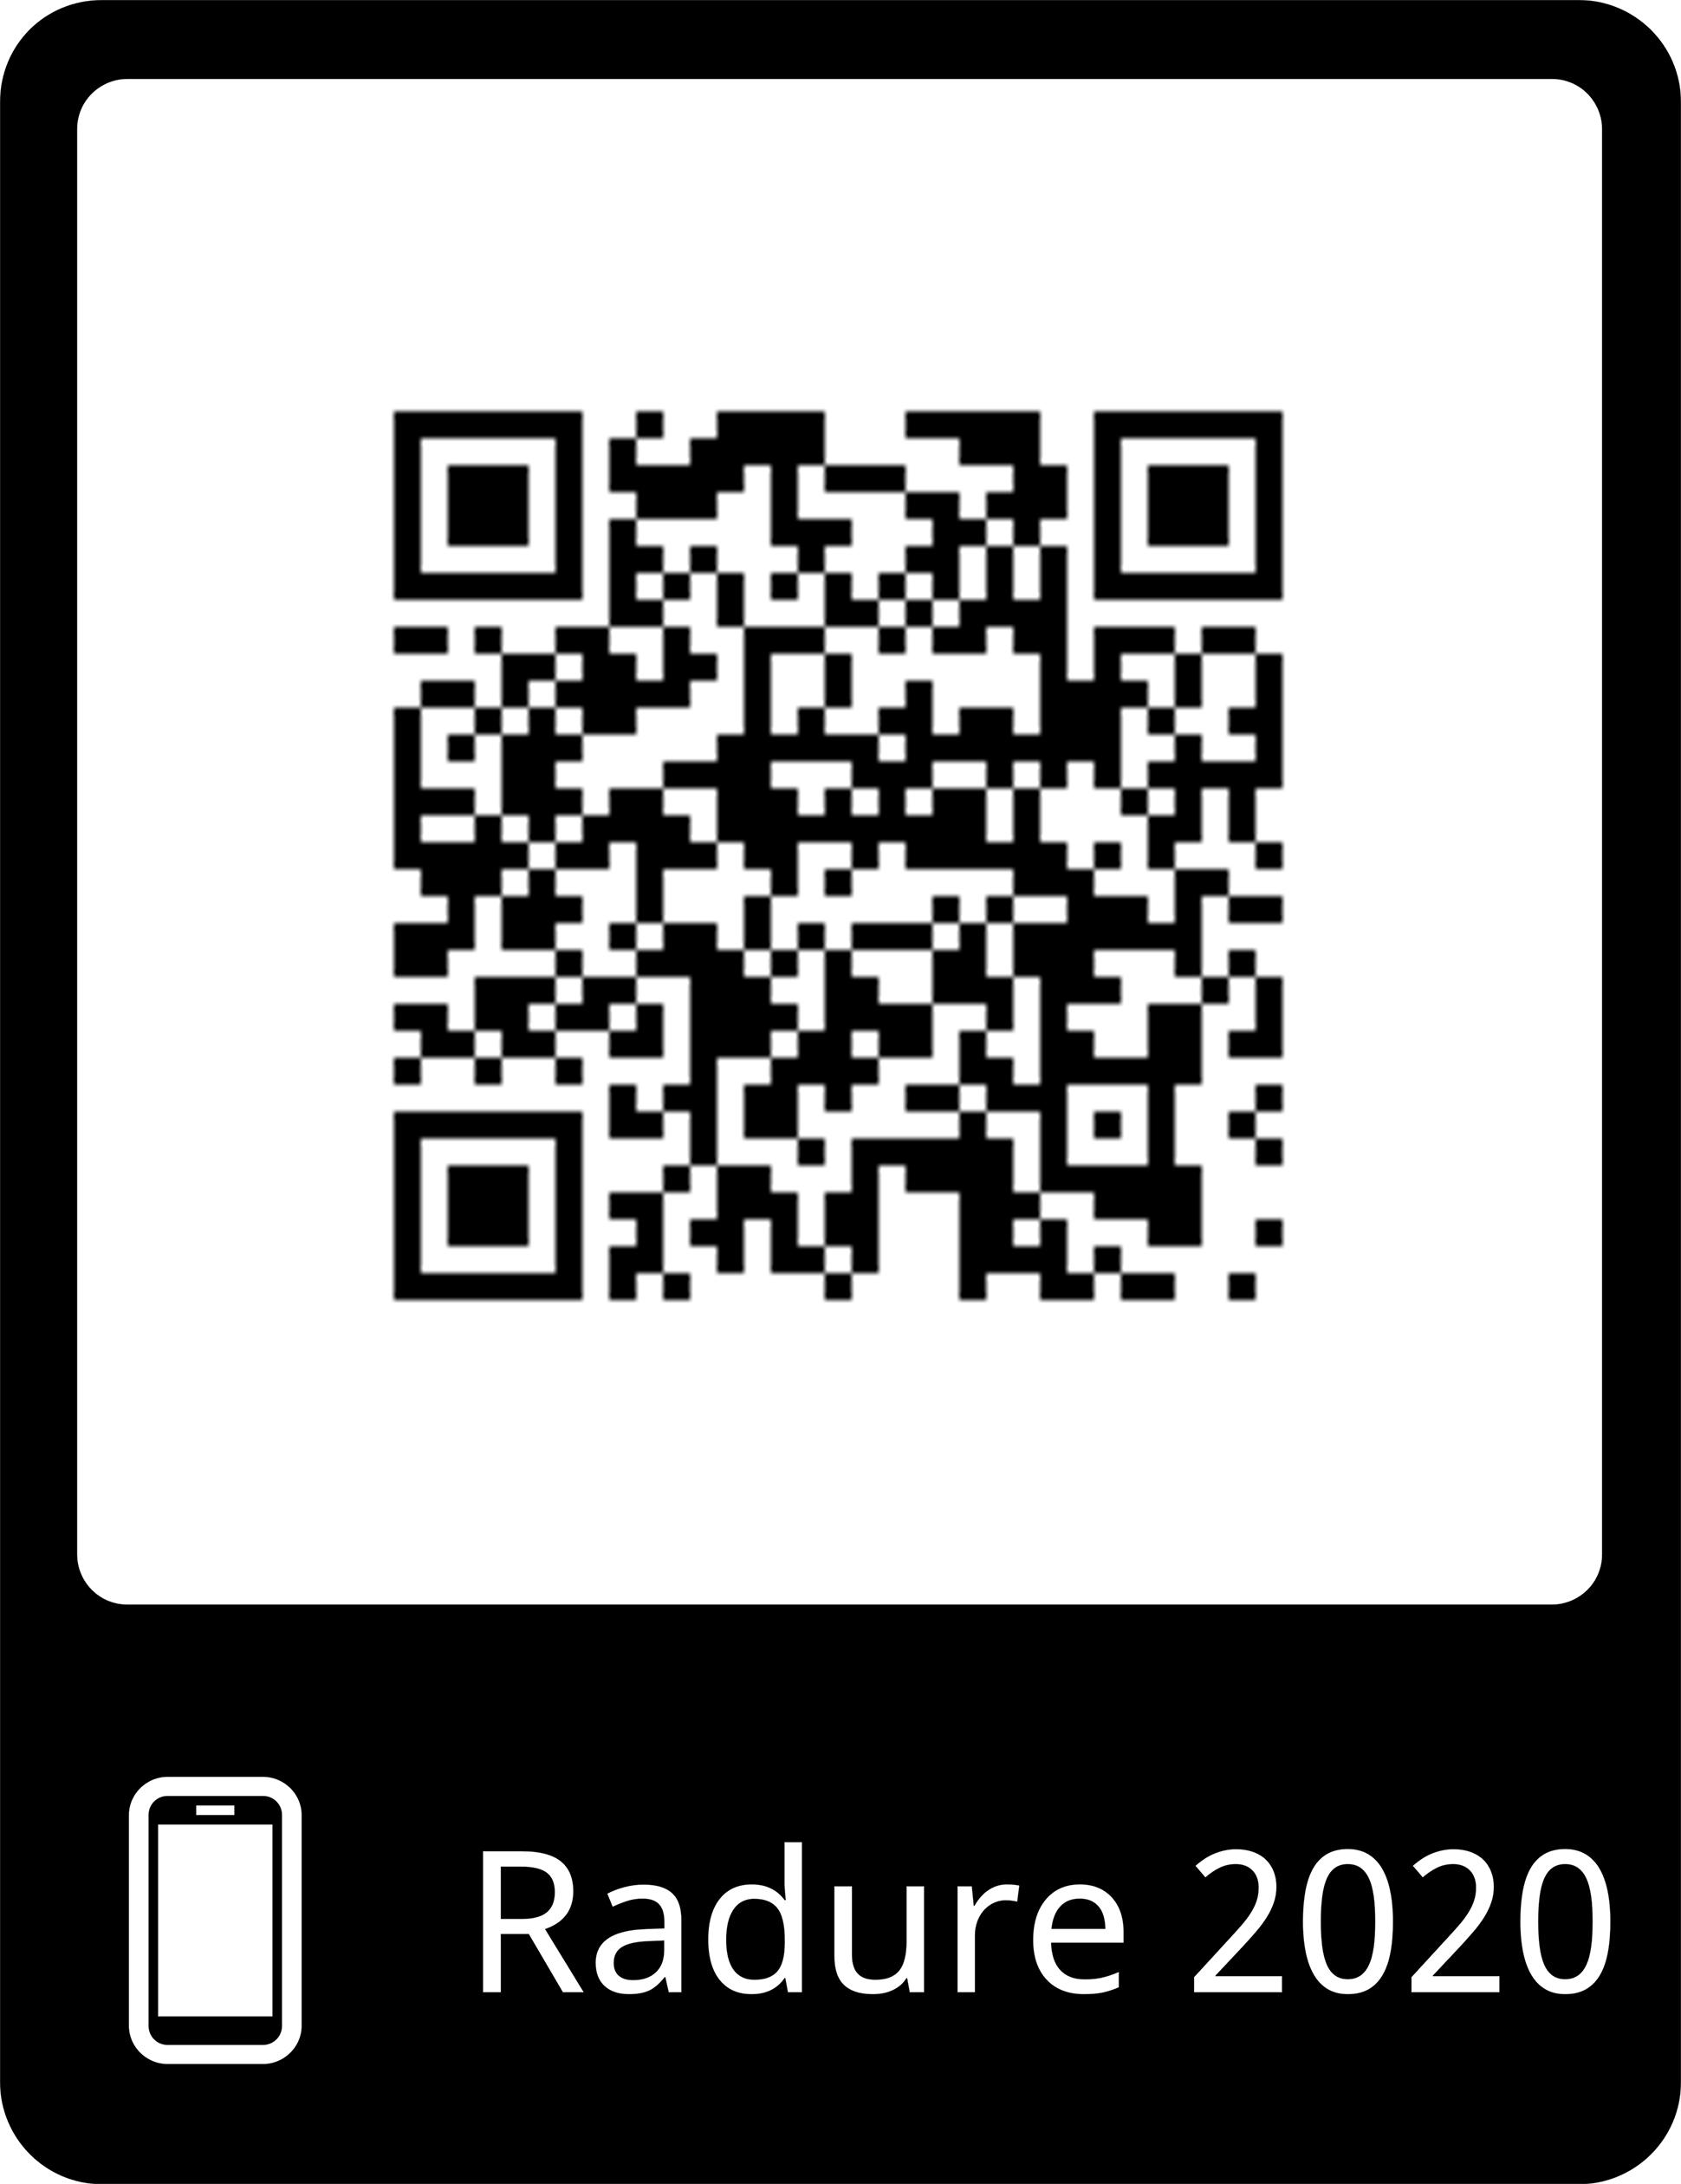 qr-code-radure-2020-frame